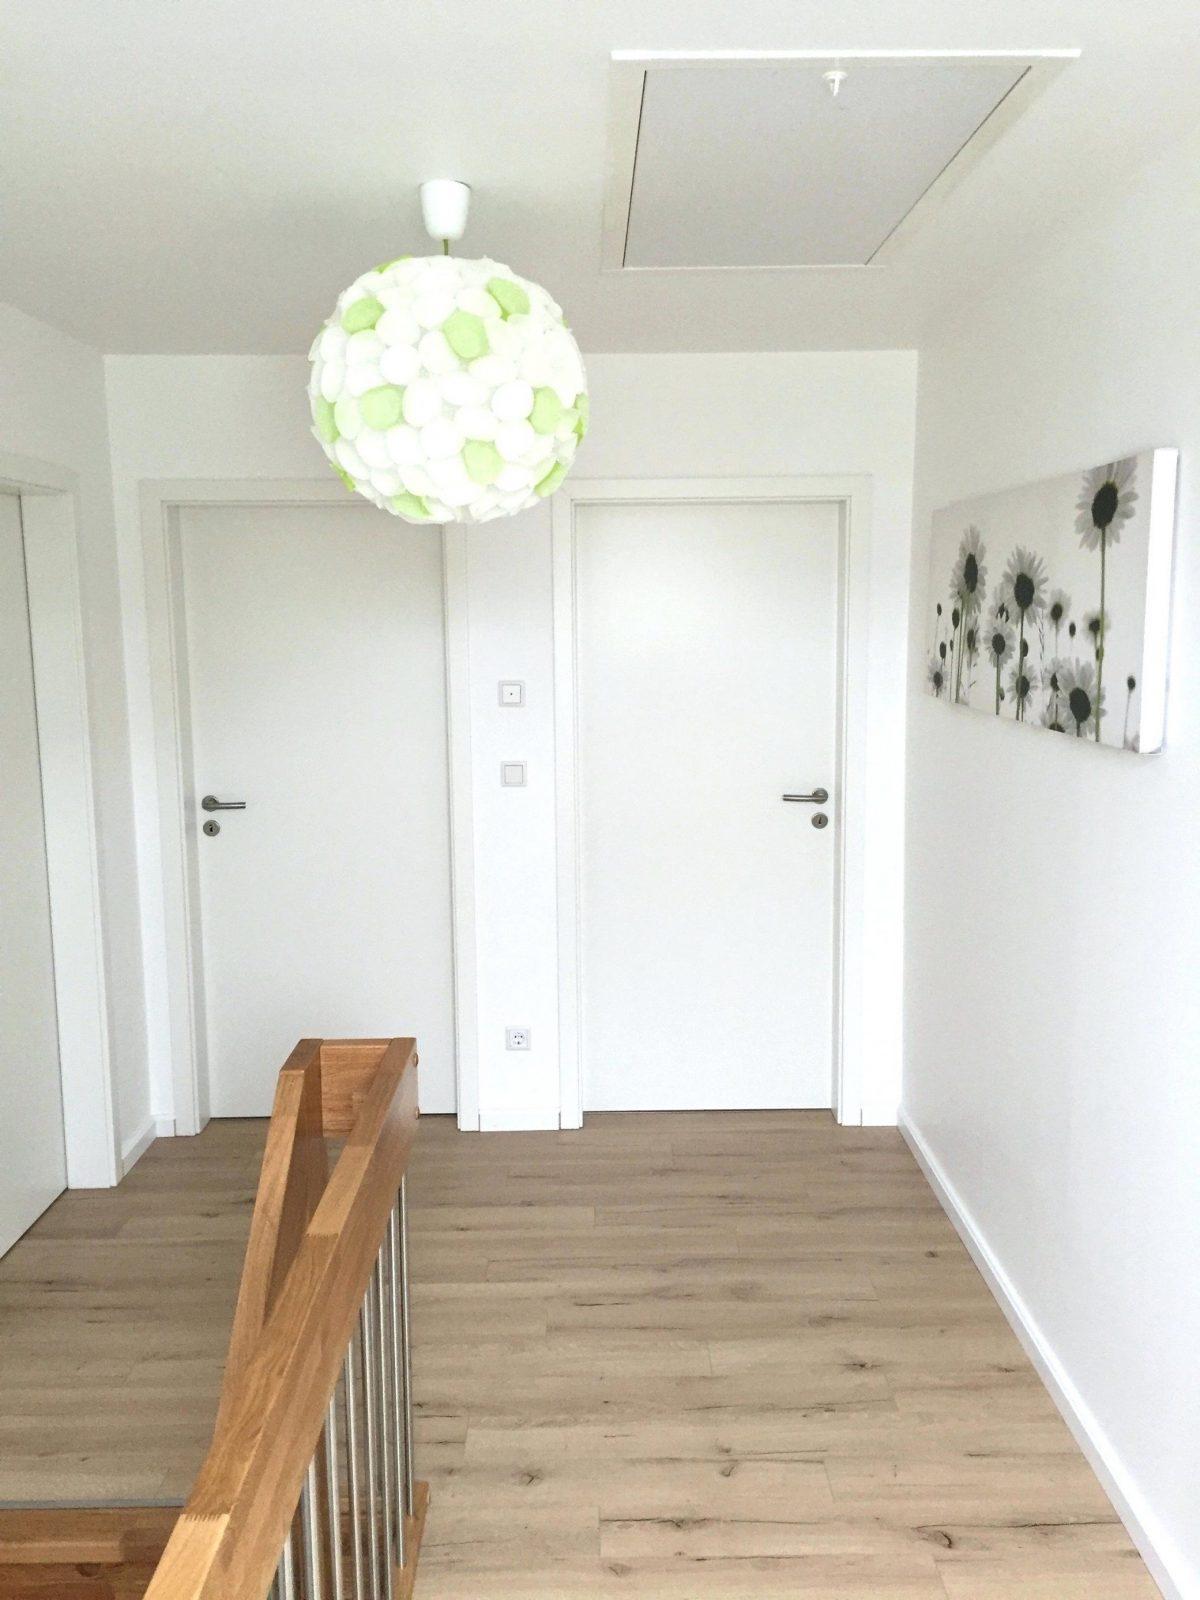 deko ideen hauseingang fr hling luxus deko ideen vor der haust r von deko ideen vor der haust r. Black Bedroom Furniture Sets. Home Design Ideas